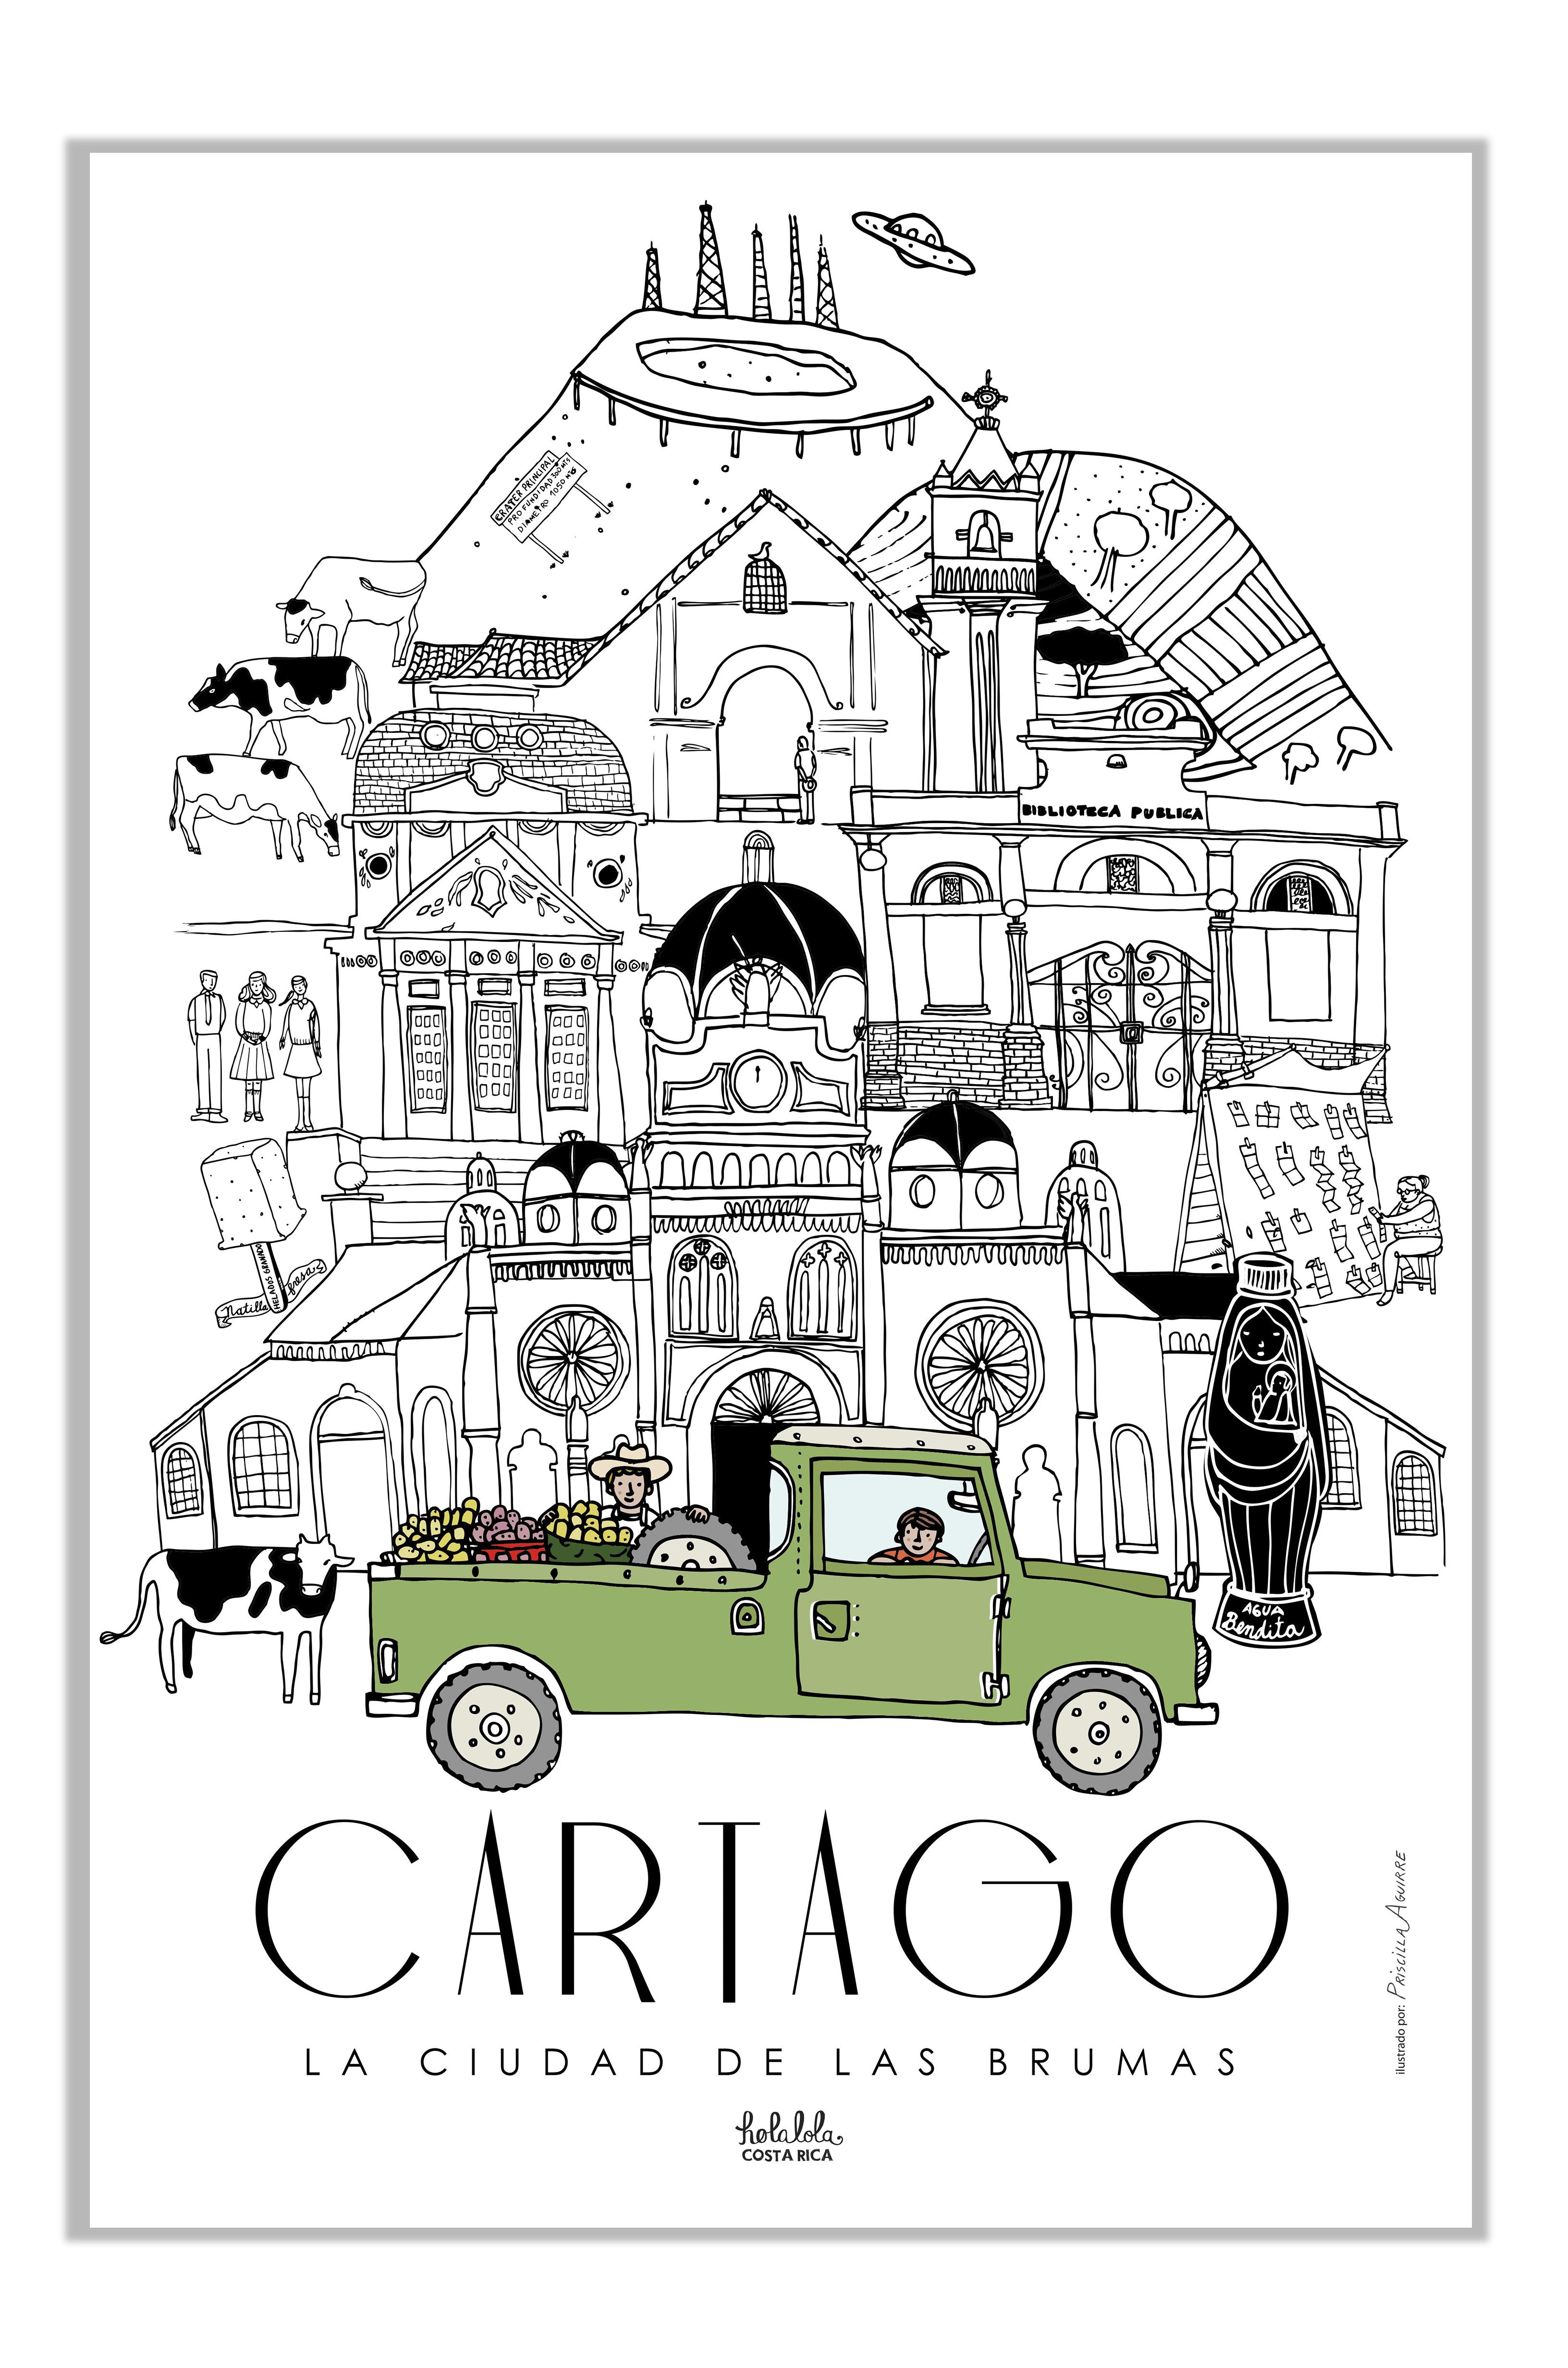 Cartago poster.